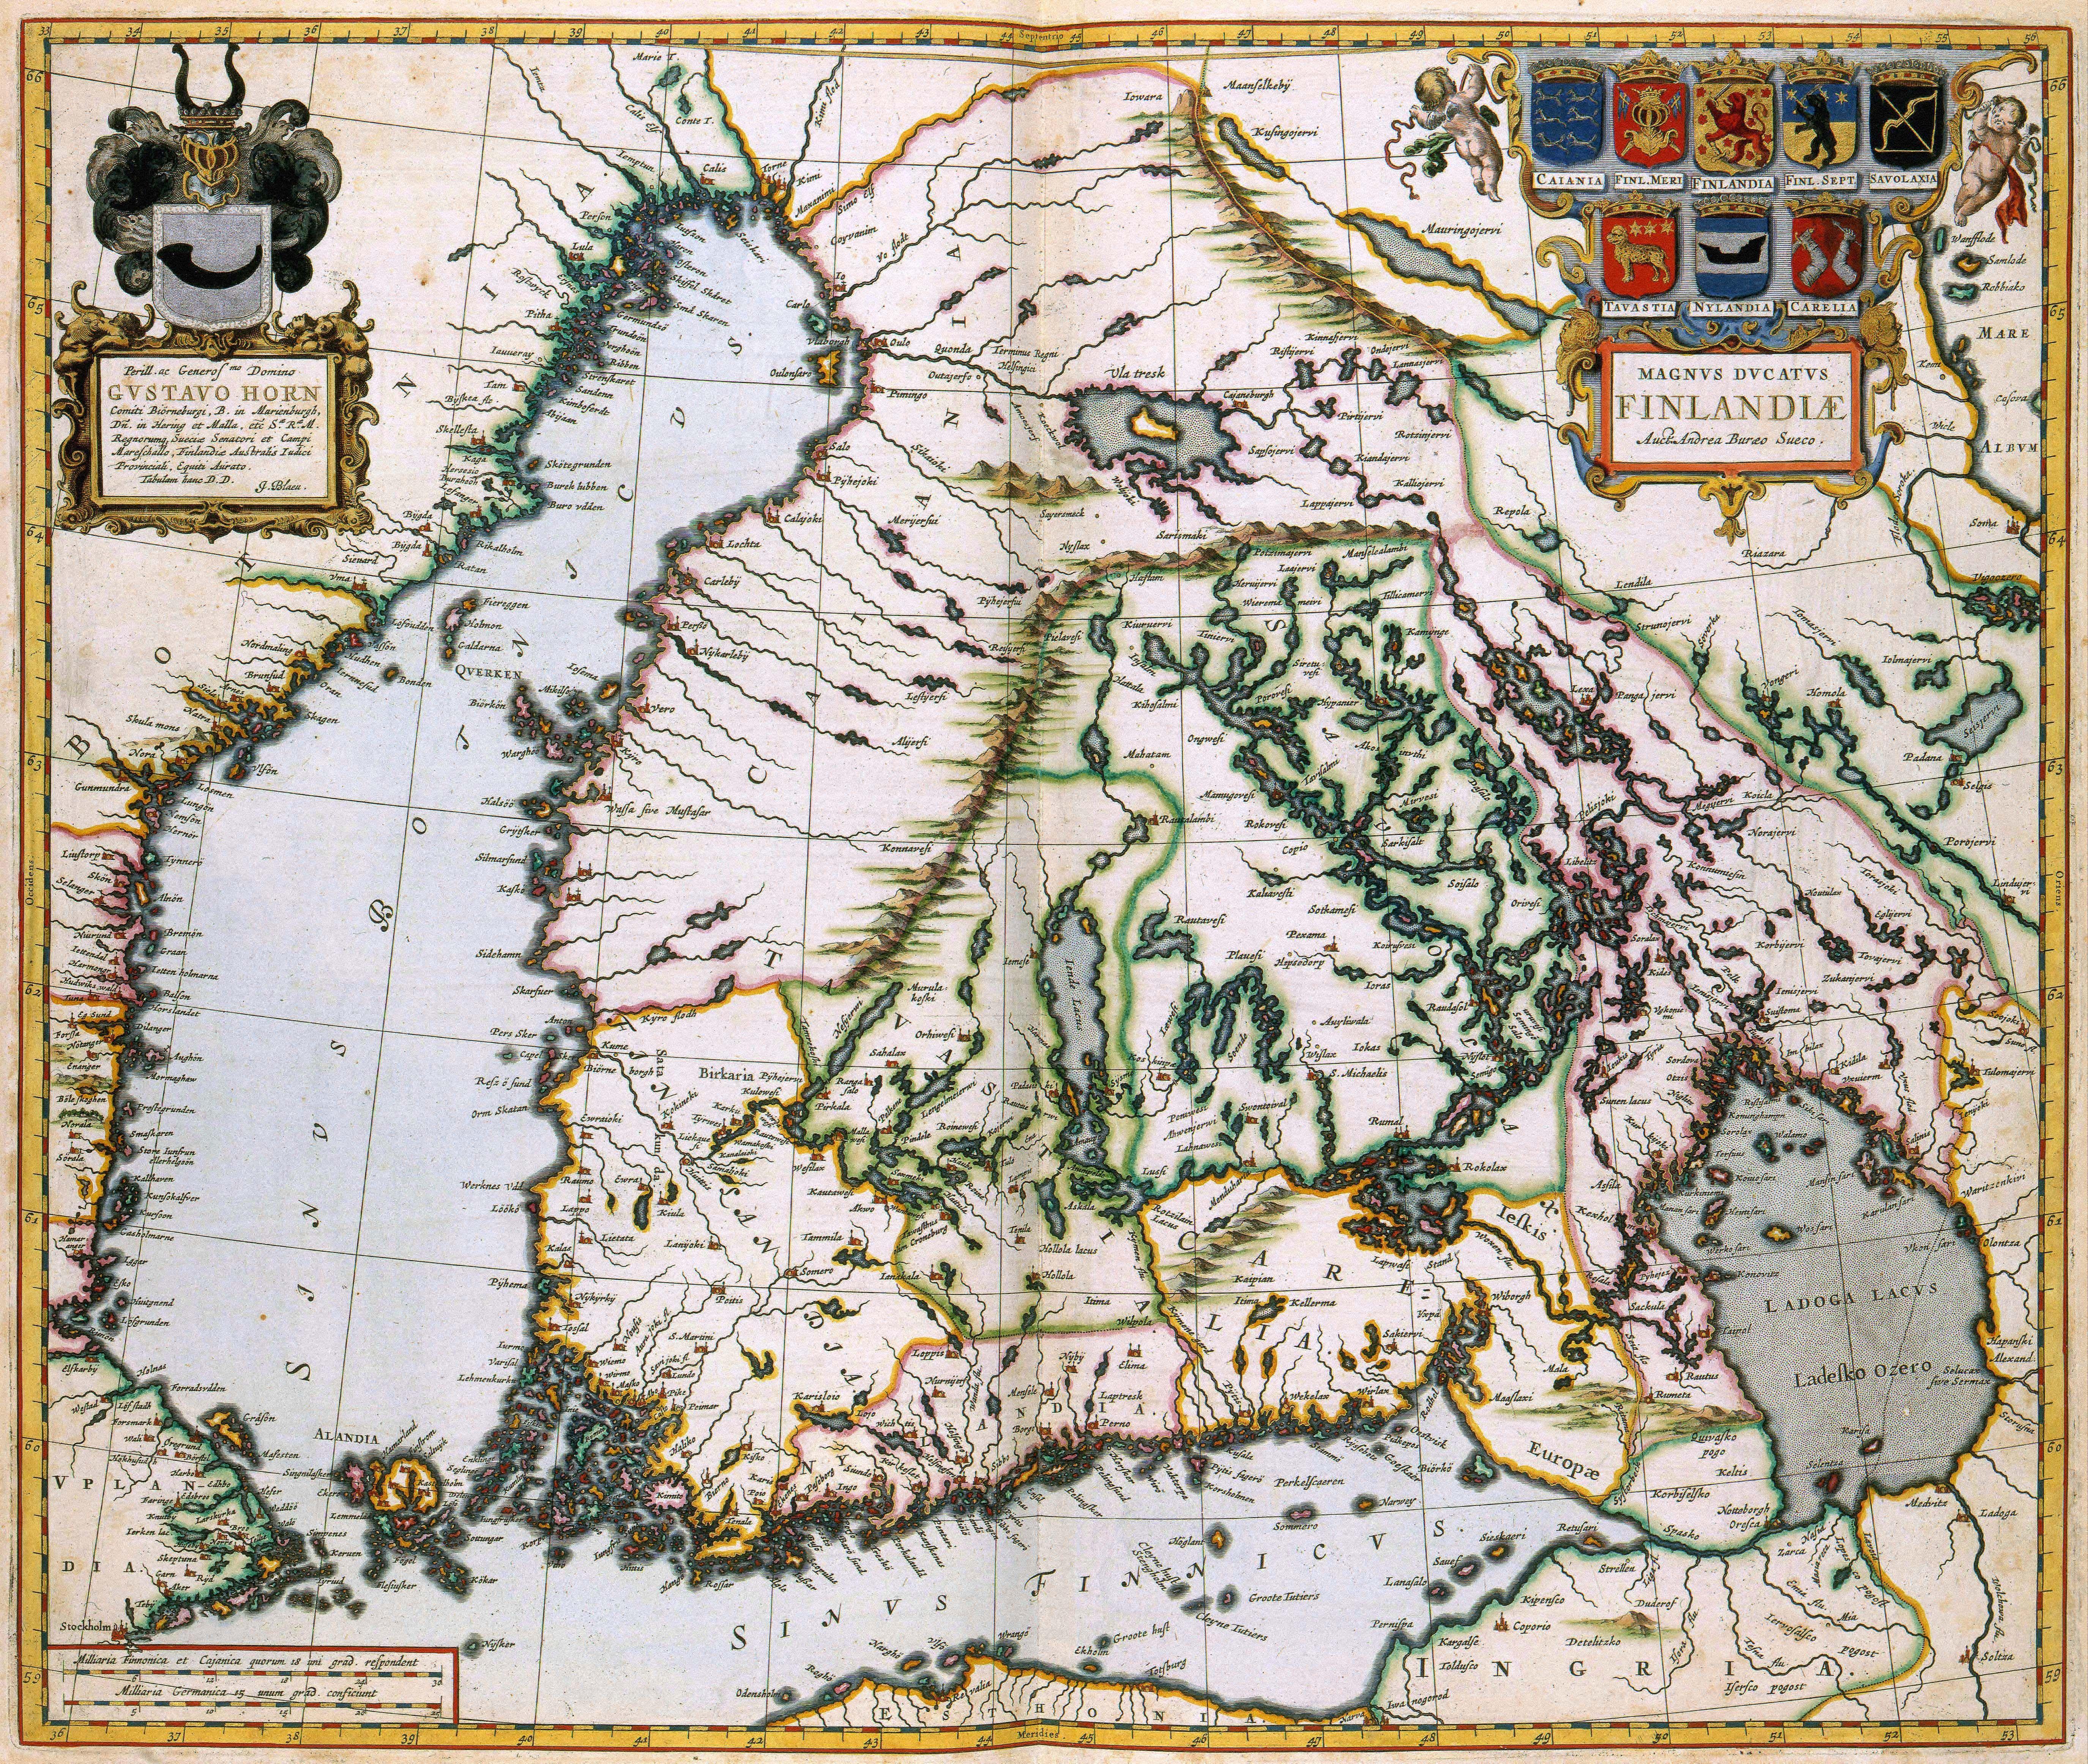 Finland atlas van der hagen 1662 plattegronden cartography explore old maps finland and more gumiabroncs Choice Image